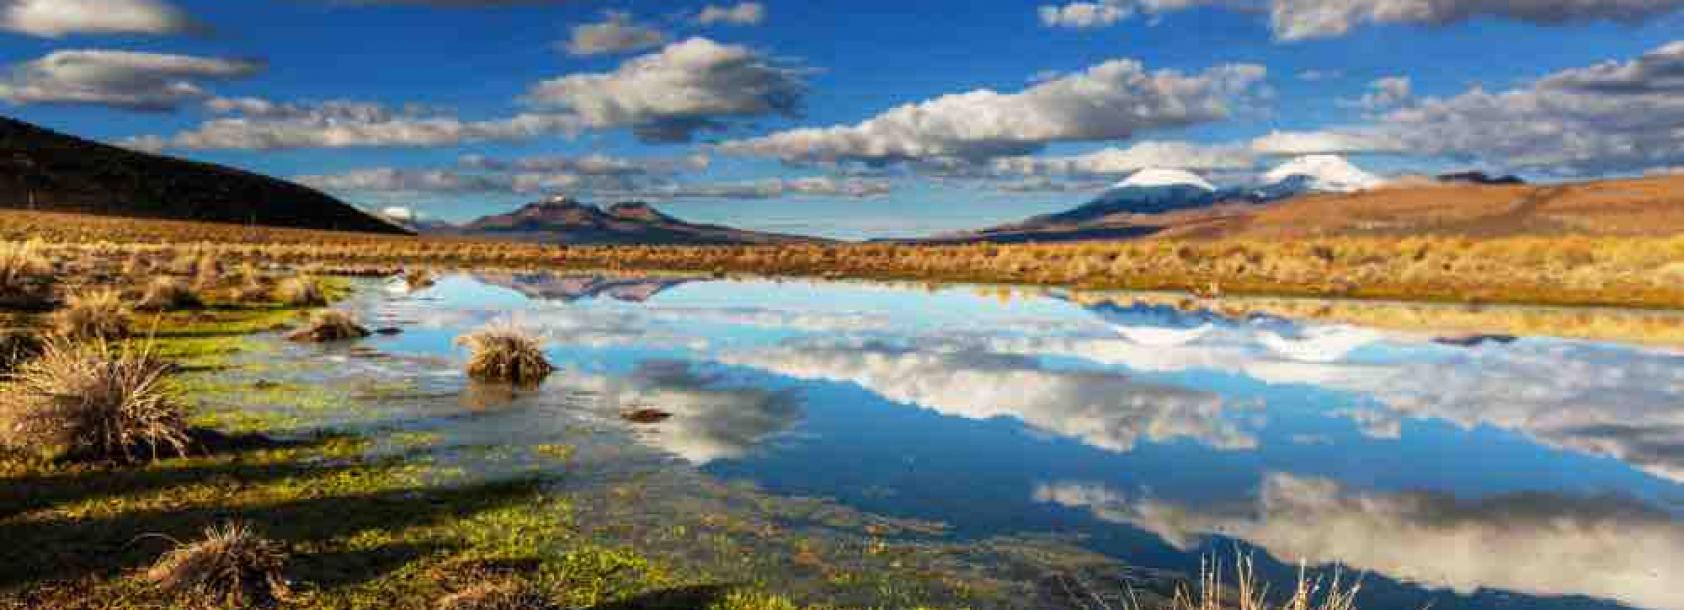 Bolivia 1 (lake)